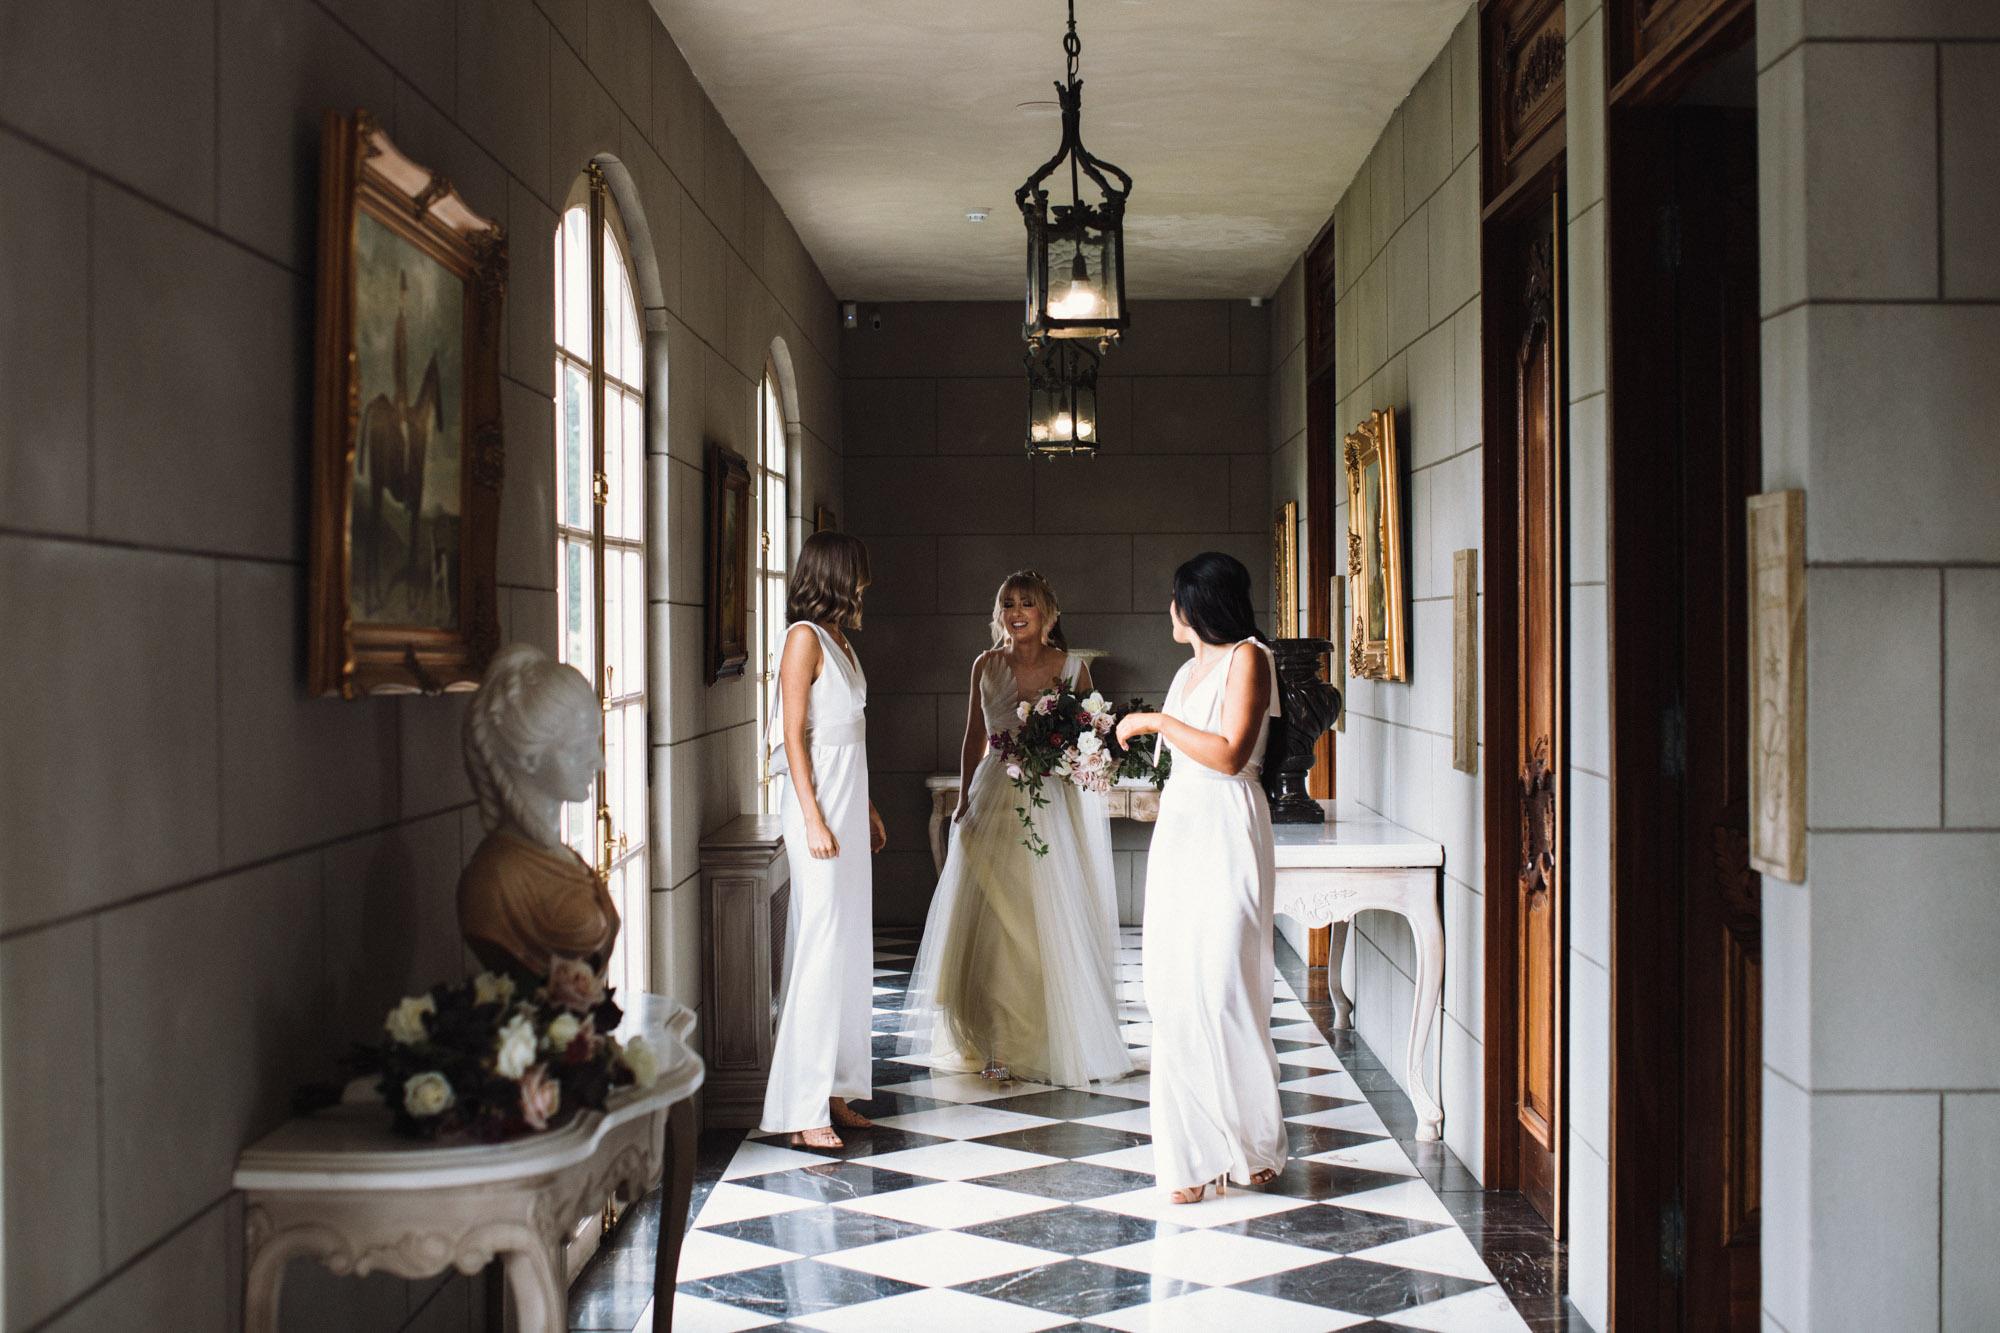 Campbell Point House Wedding HJ + Dean Raphael Weddings-52.jpg